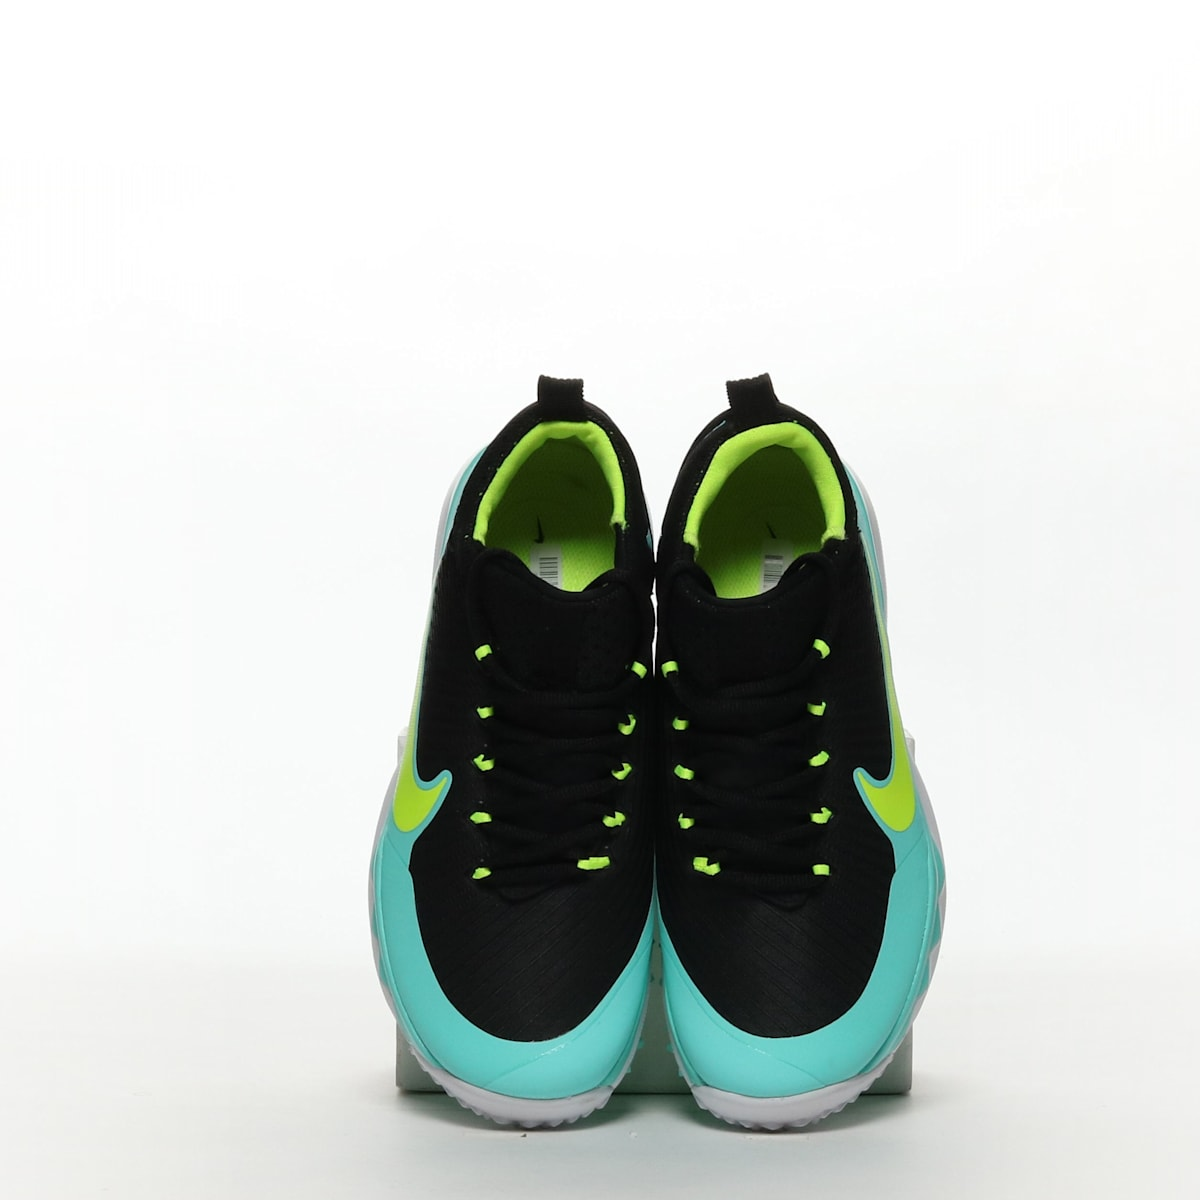 Nike fi premiere